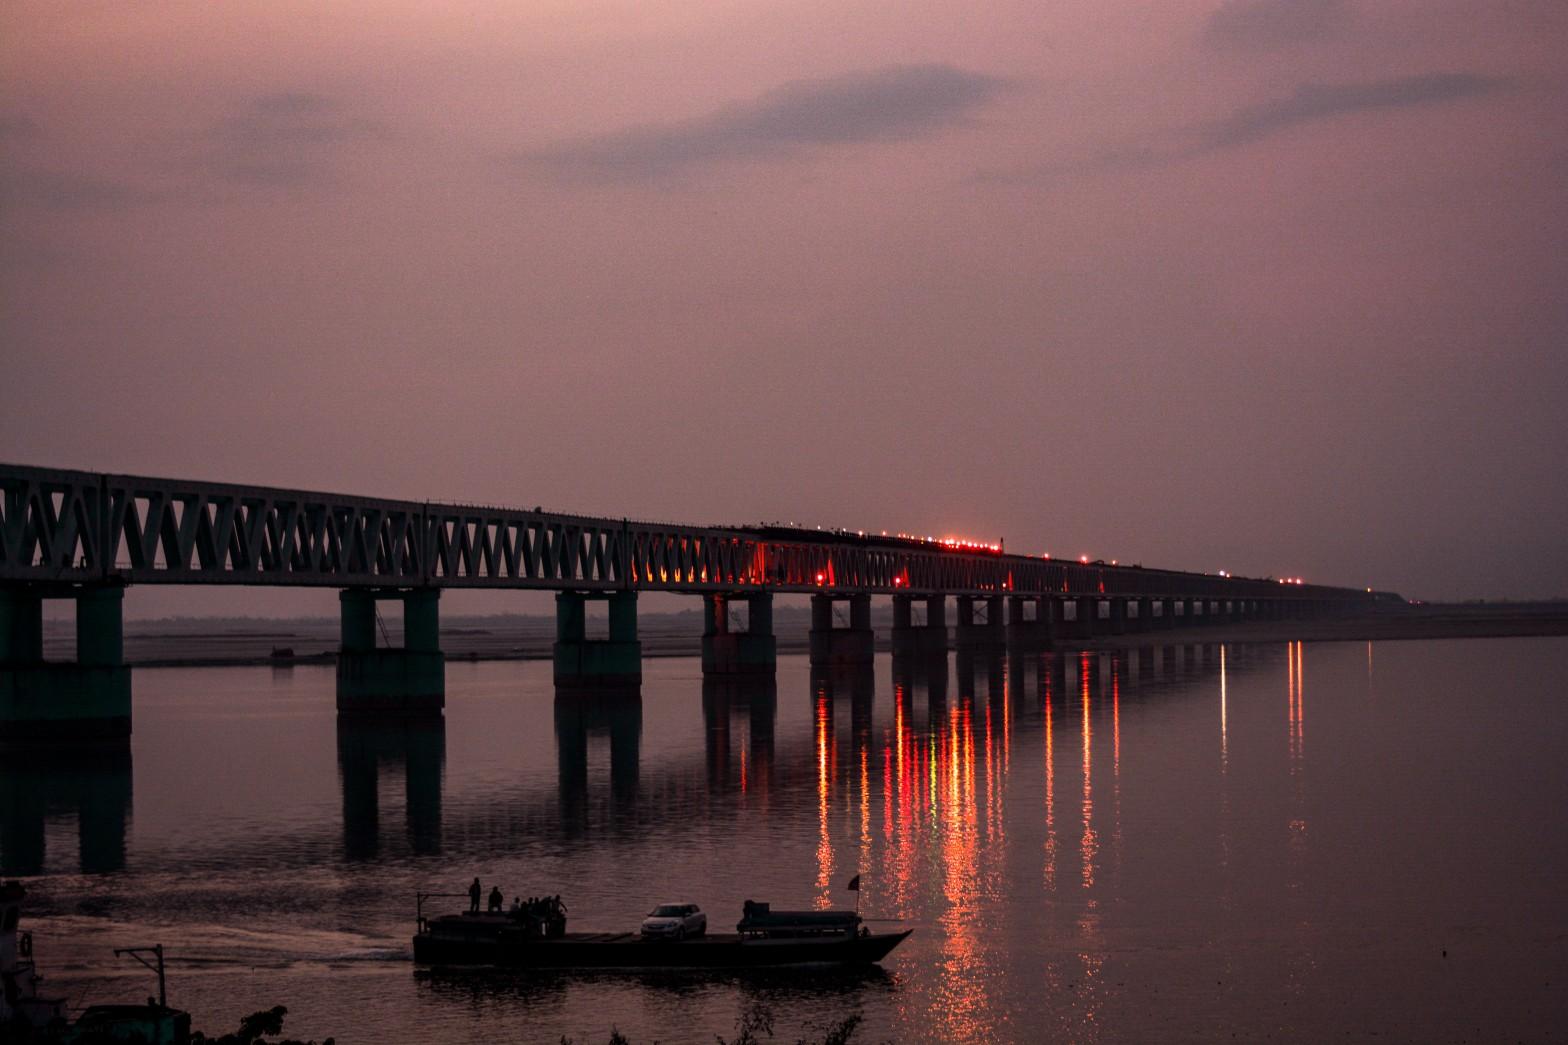 Bogibeel Bridge at sunset